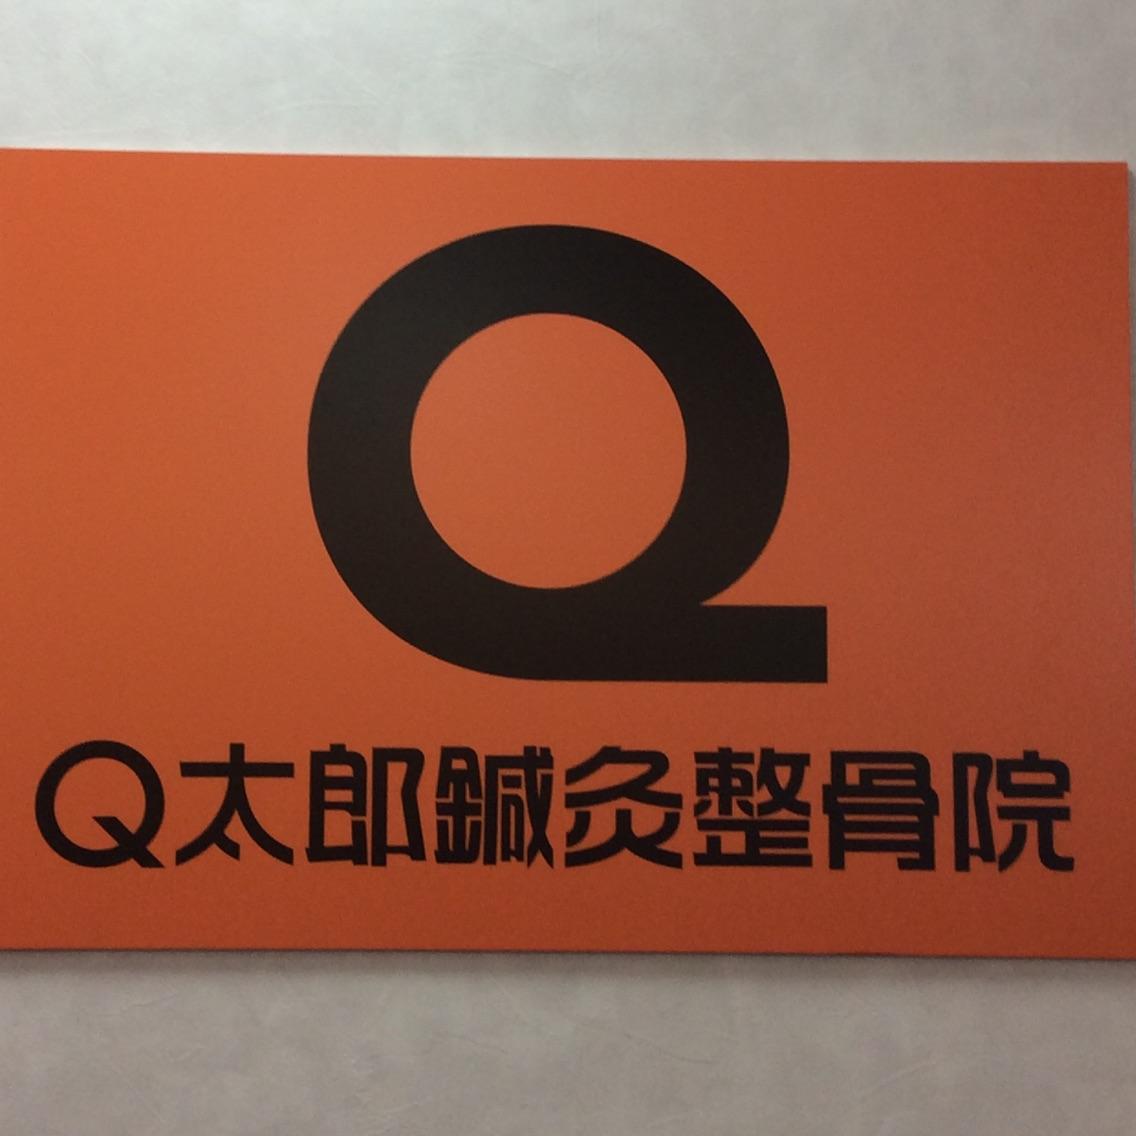 Q太郎鍼灸院